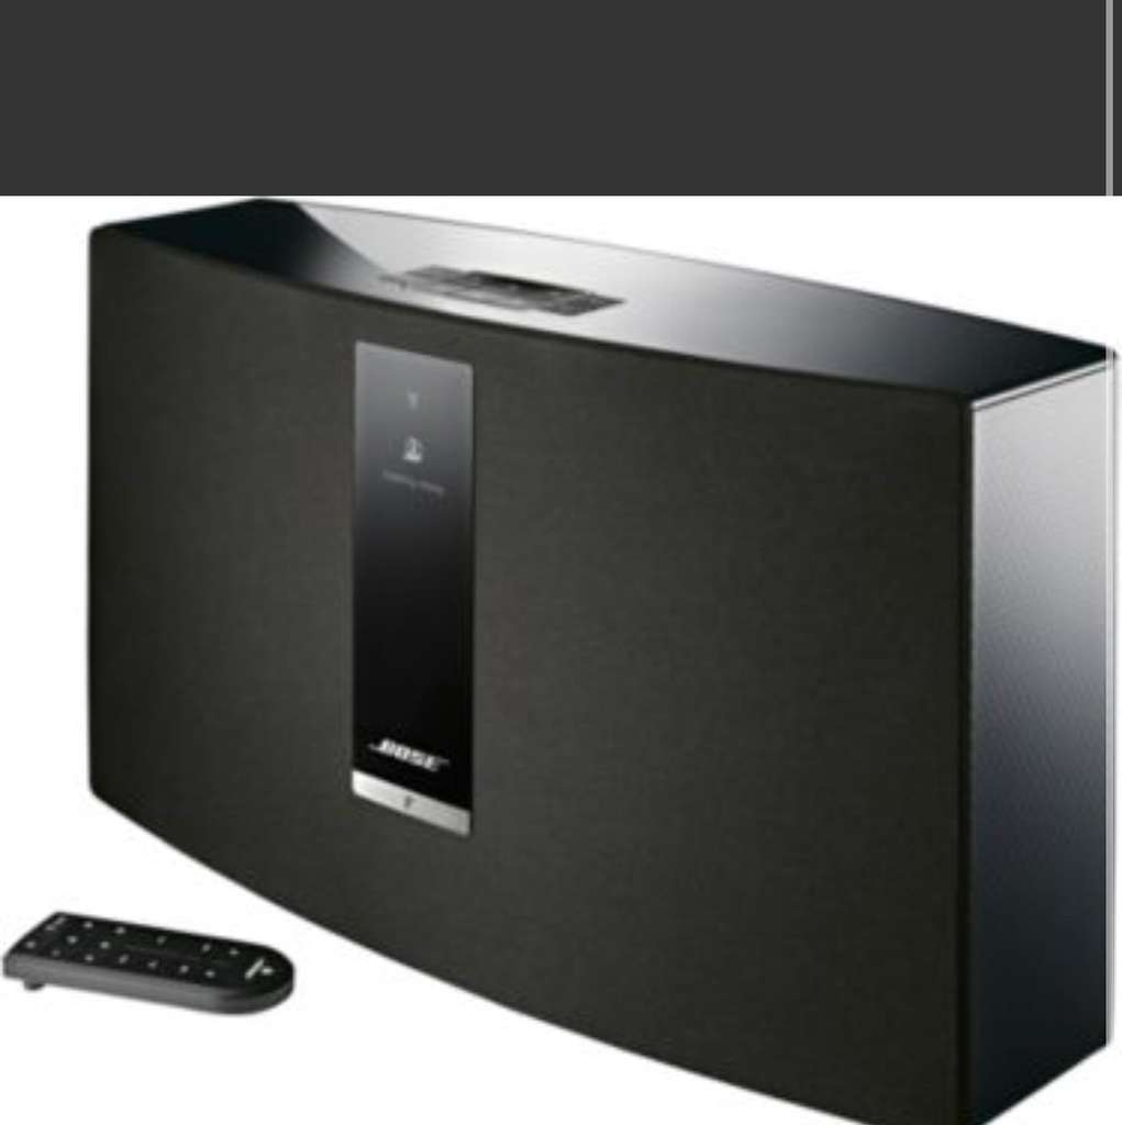 enceinte multiroom bose soundtouch 30 iii noir. Black Bedroom Furniture Sets. Home Design Ideas